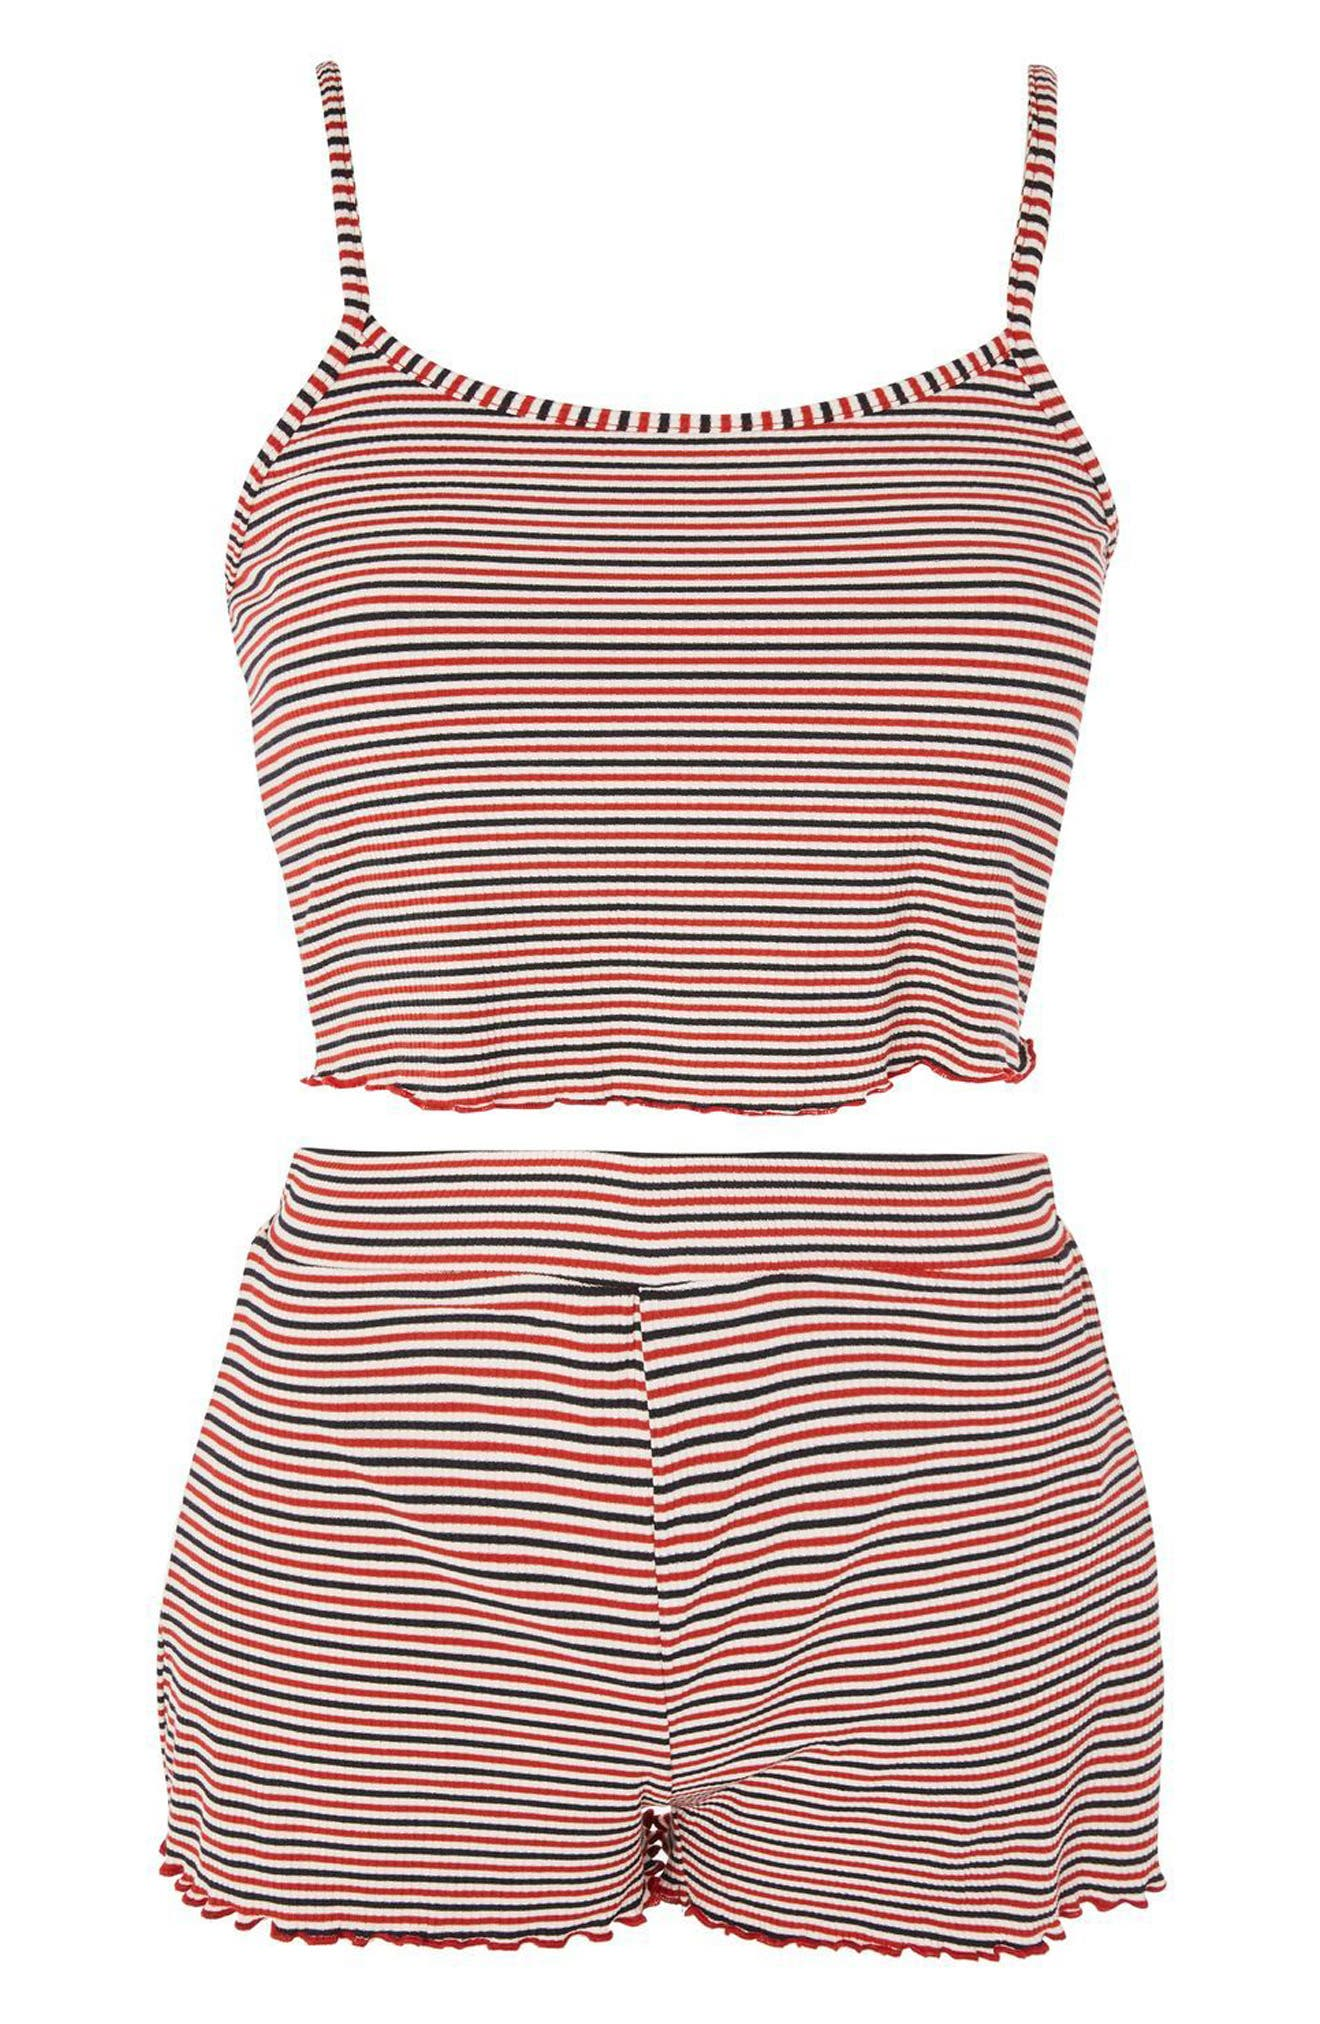 Striped Pajamas,                             Alternate thumbnail 3, color,                             600